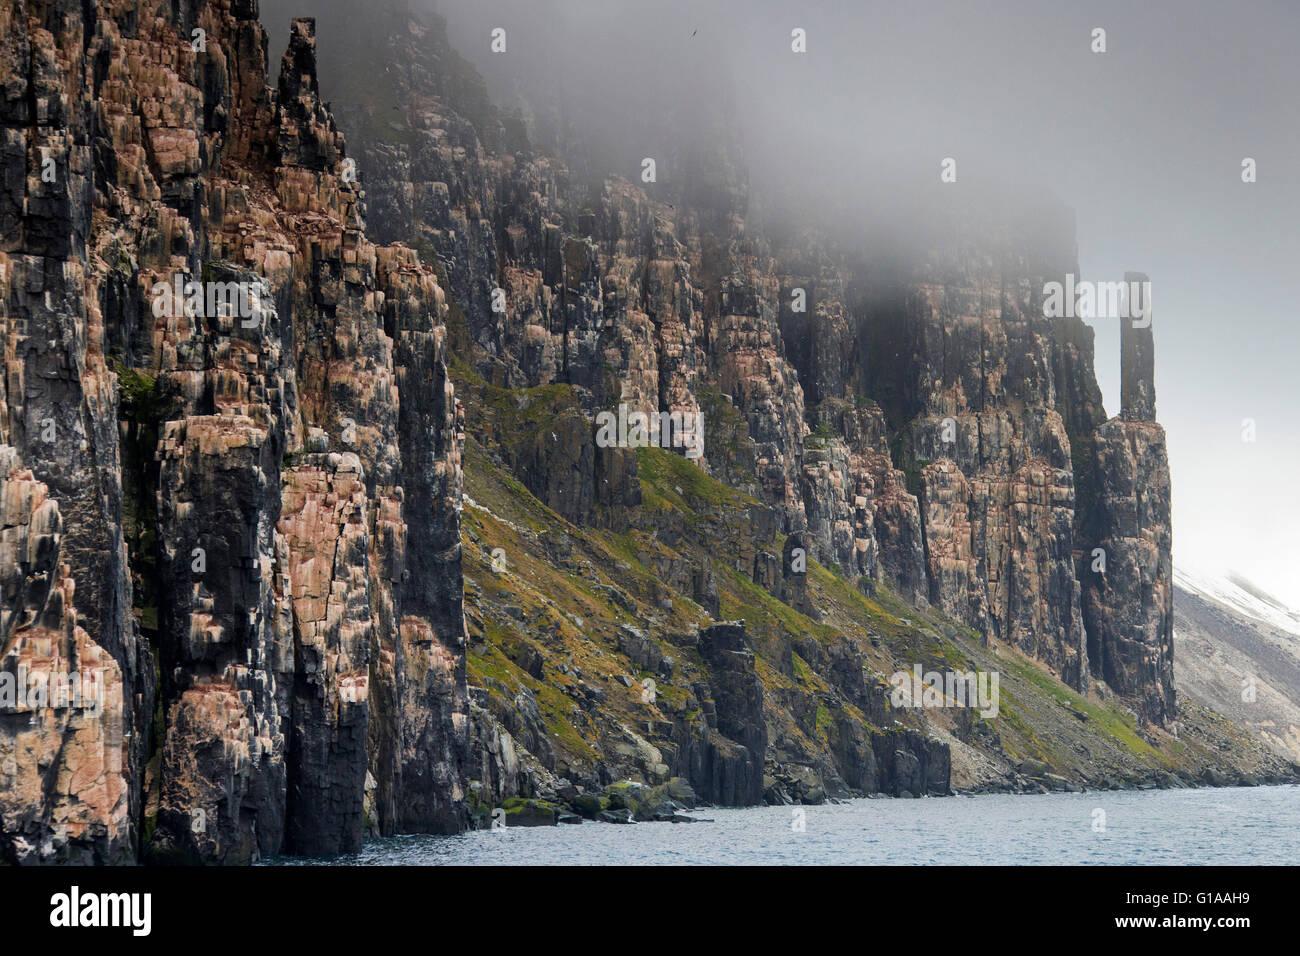 Seabird breeding colony in basalt cliff Alkefjellet, Lomfjordhalvøya in Ny-Friesland at Spitsbergen / Svalbard - Stock Image